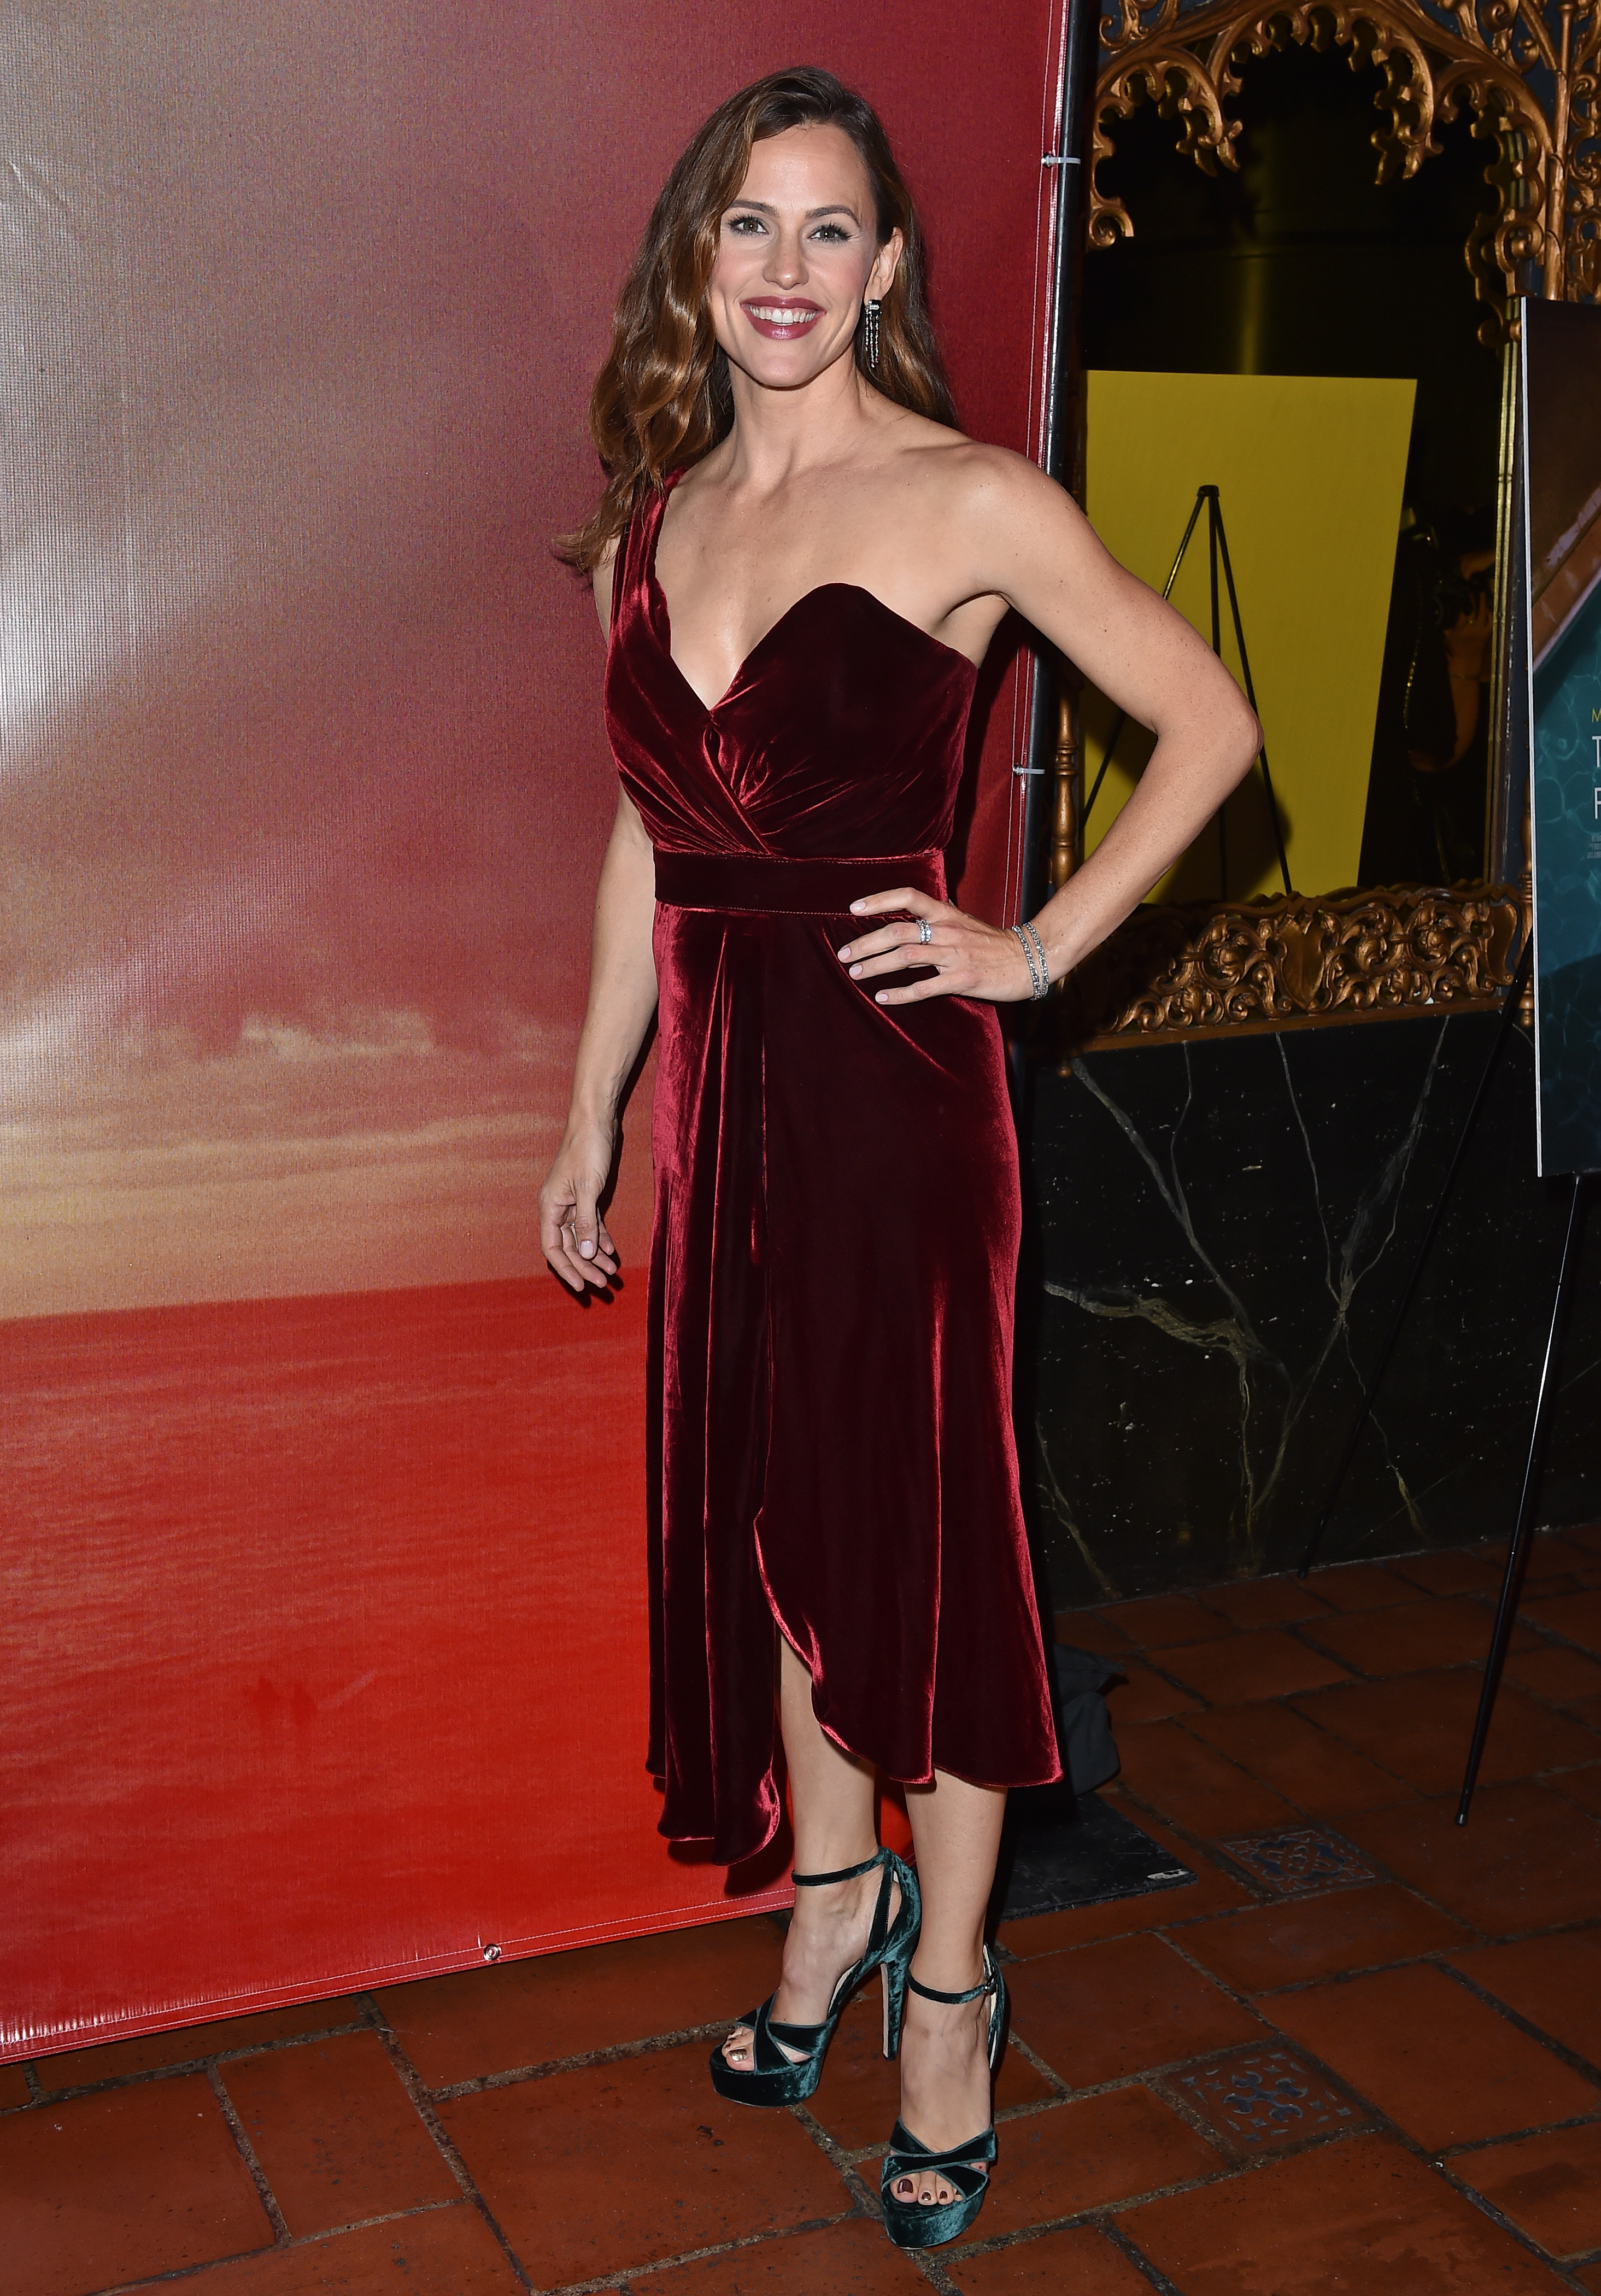 Jennifer Garner Attends 'The Tribes of Palos Verdes' Premiere